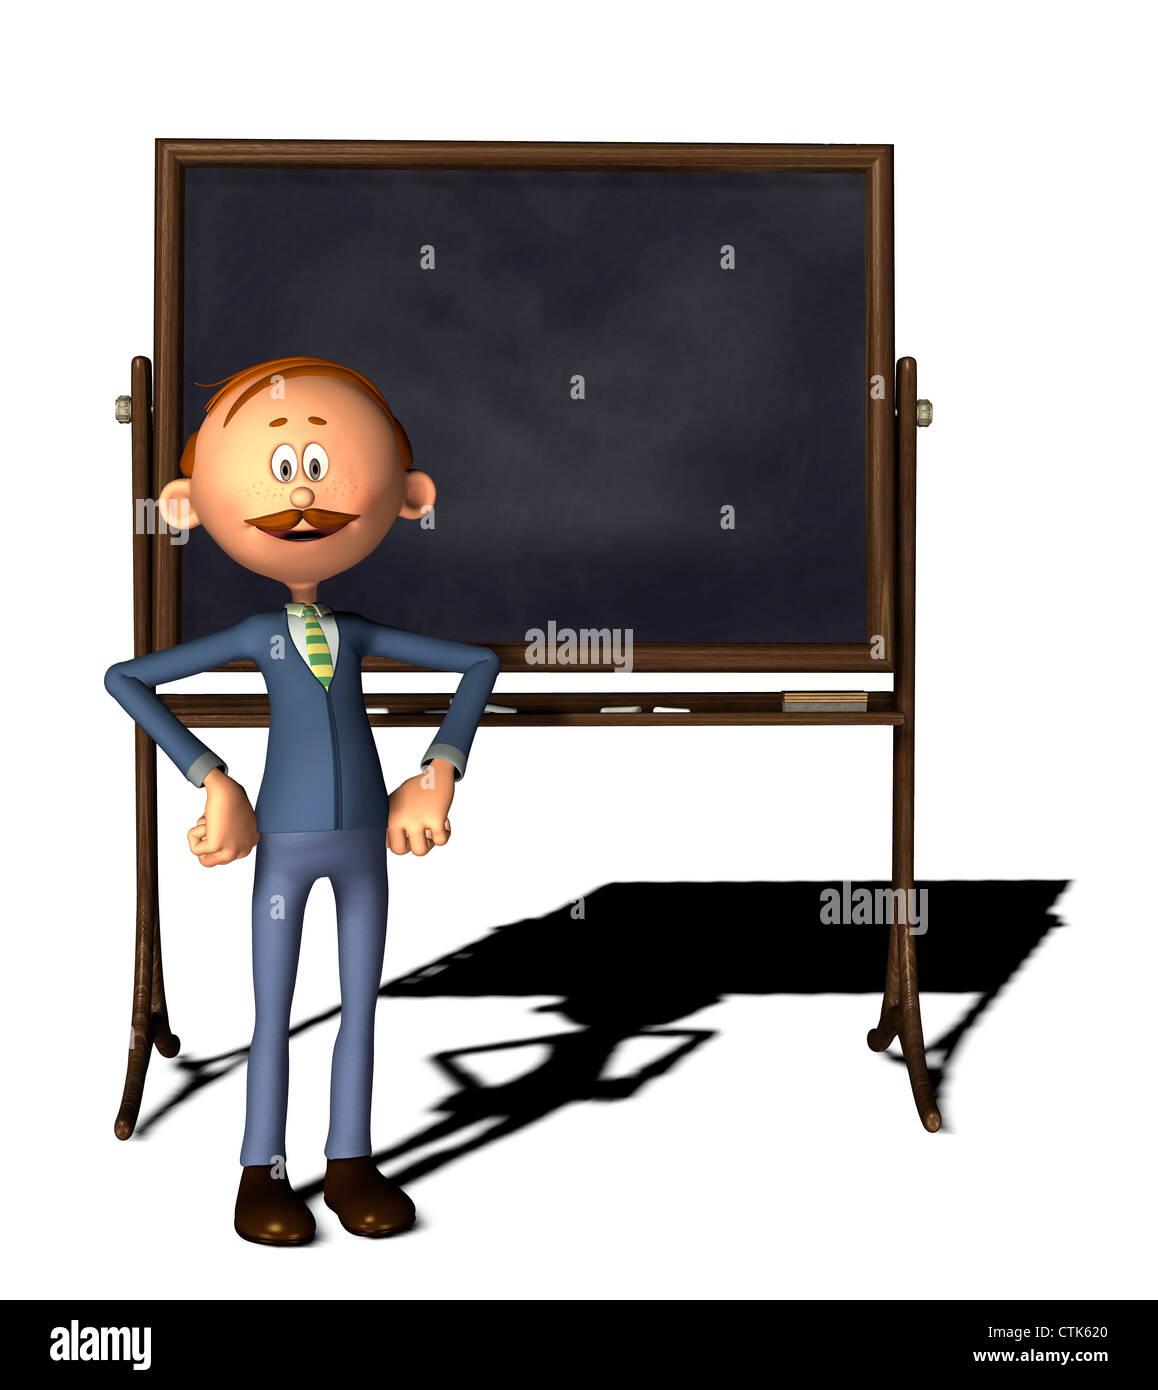 cartoon figure teacher with board Stock Photo